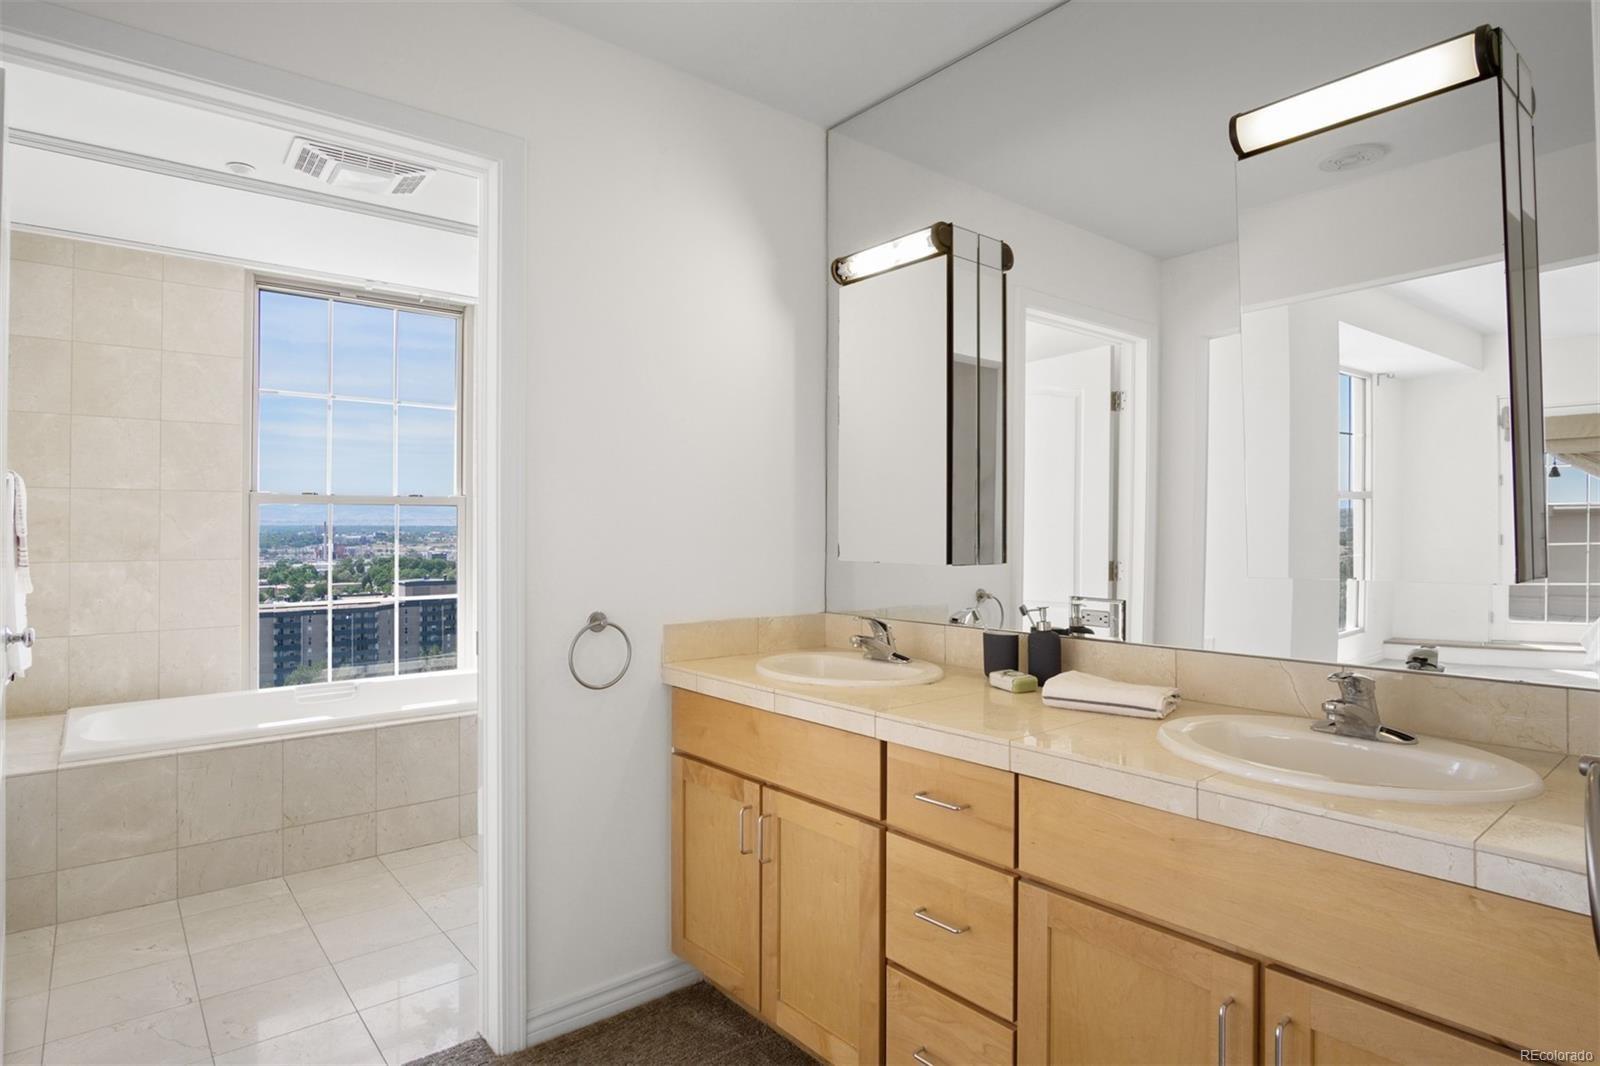 MLS# 9962338 - 1 - 300  W 11th Avenue, Denver, CO 80204